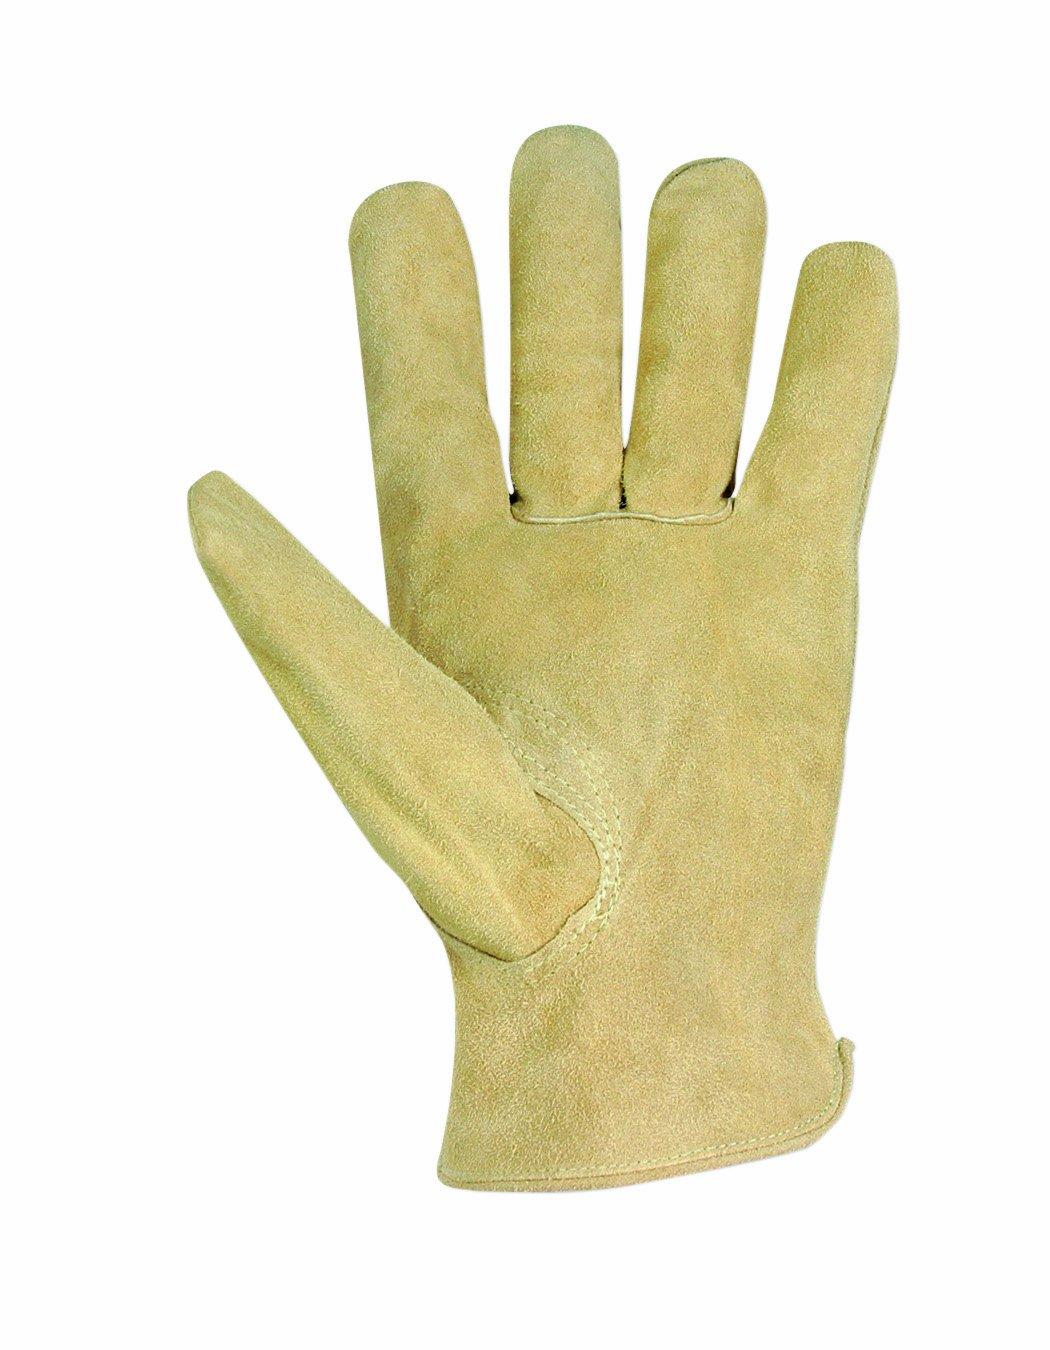 3pk wolverine leather work gloves extra large - Custom Leathercraft 2055m Split Cowhide Work Gloves Medium Leather Work Gloves Amazon Com